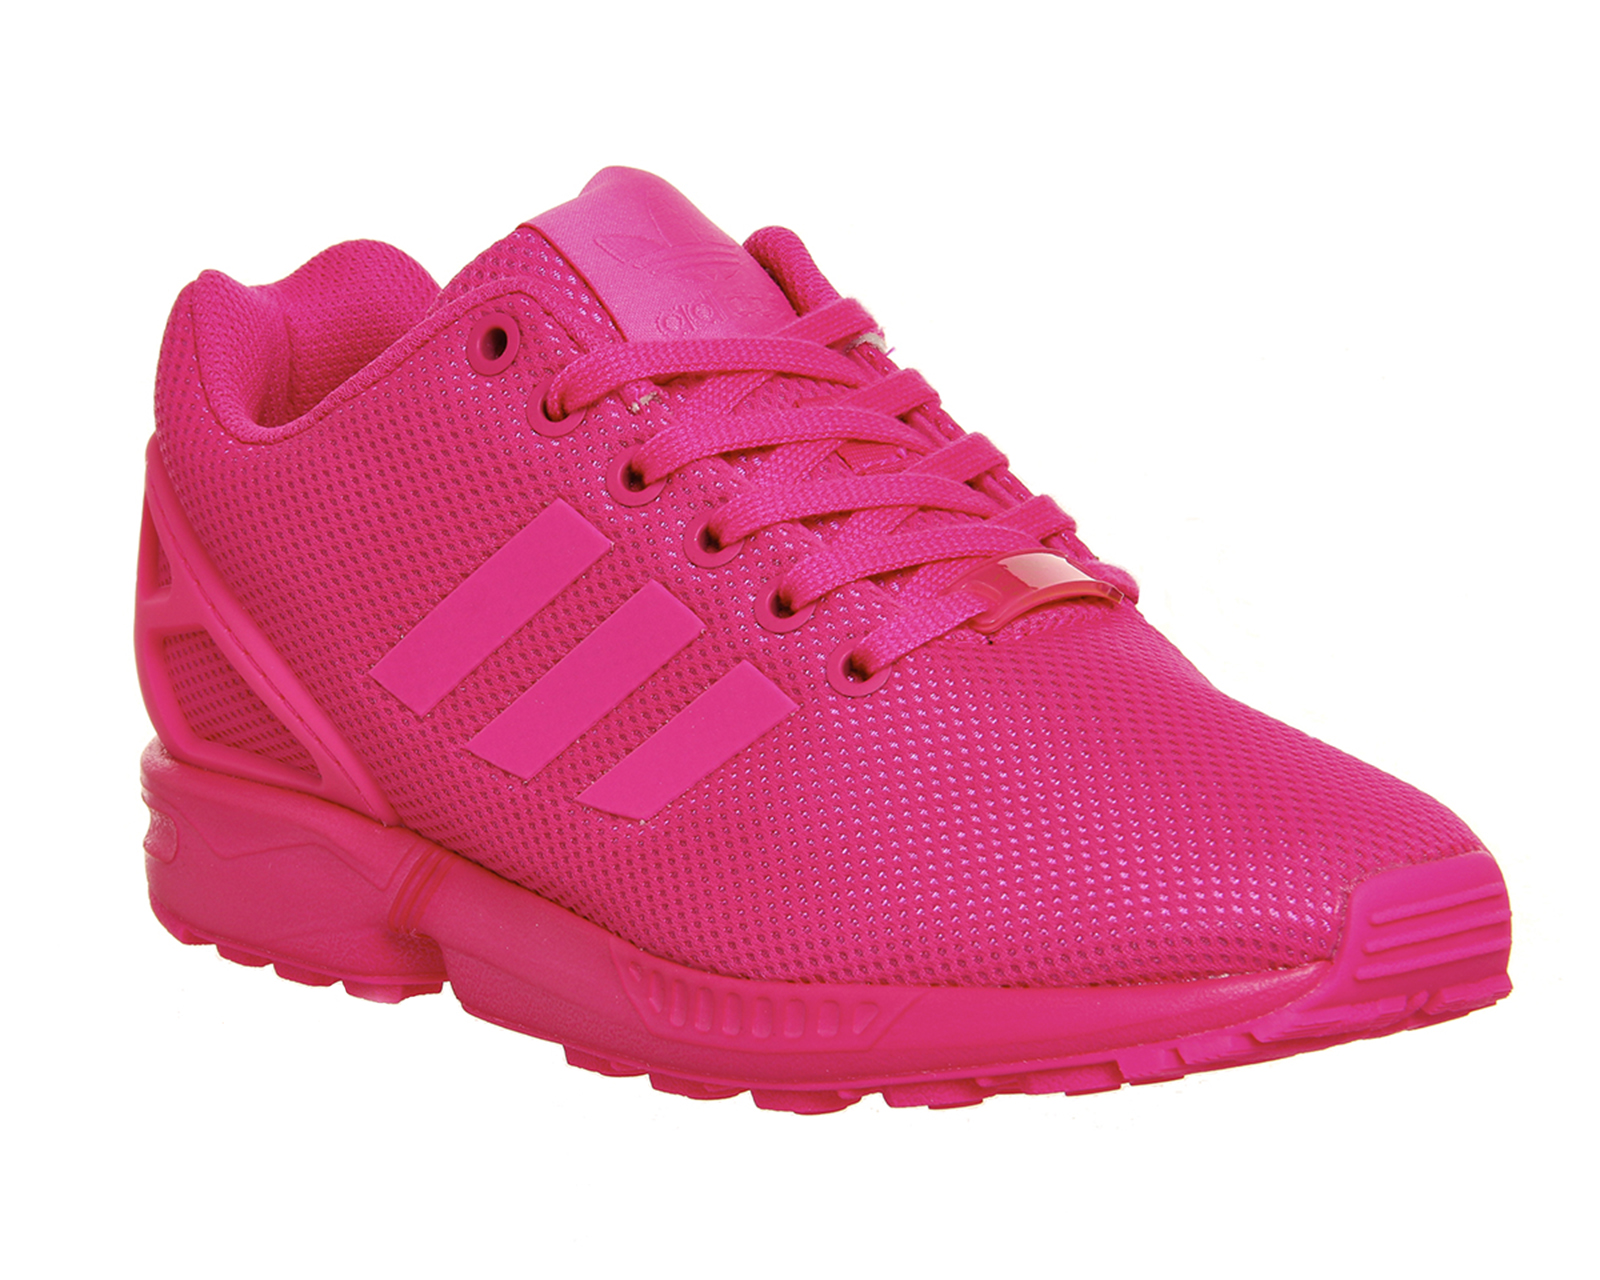 mens adidas zx flux shock pink mono trainers shoes ebay. Black Bedroom Furniture Sets. Home Design Ideas